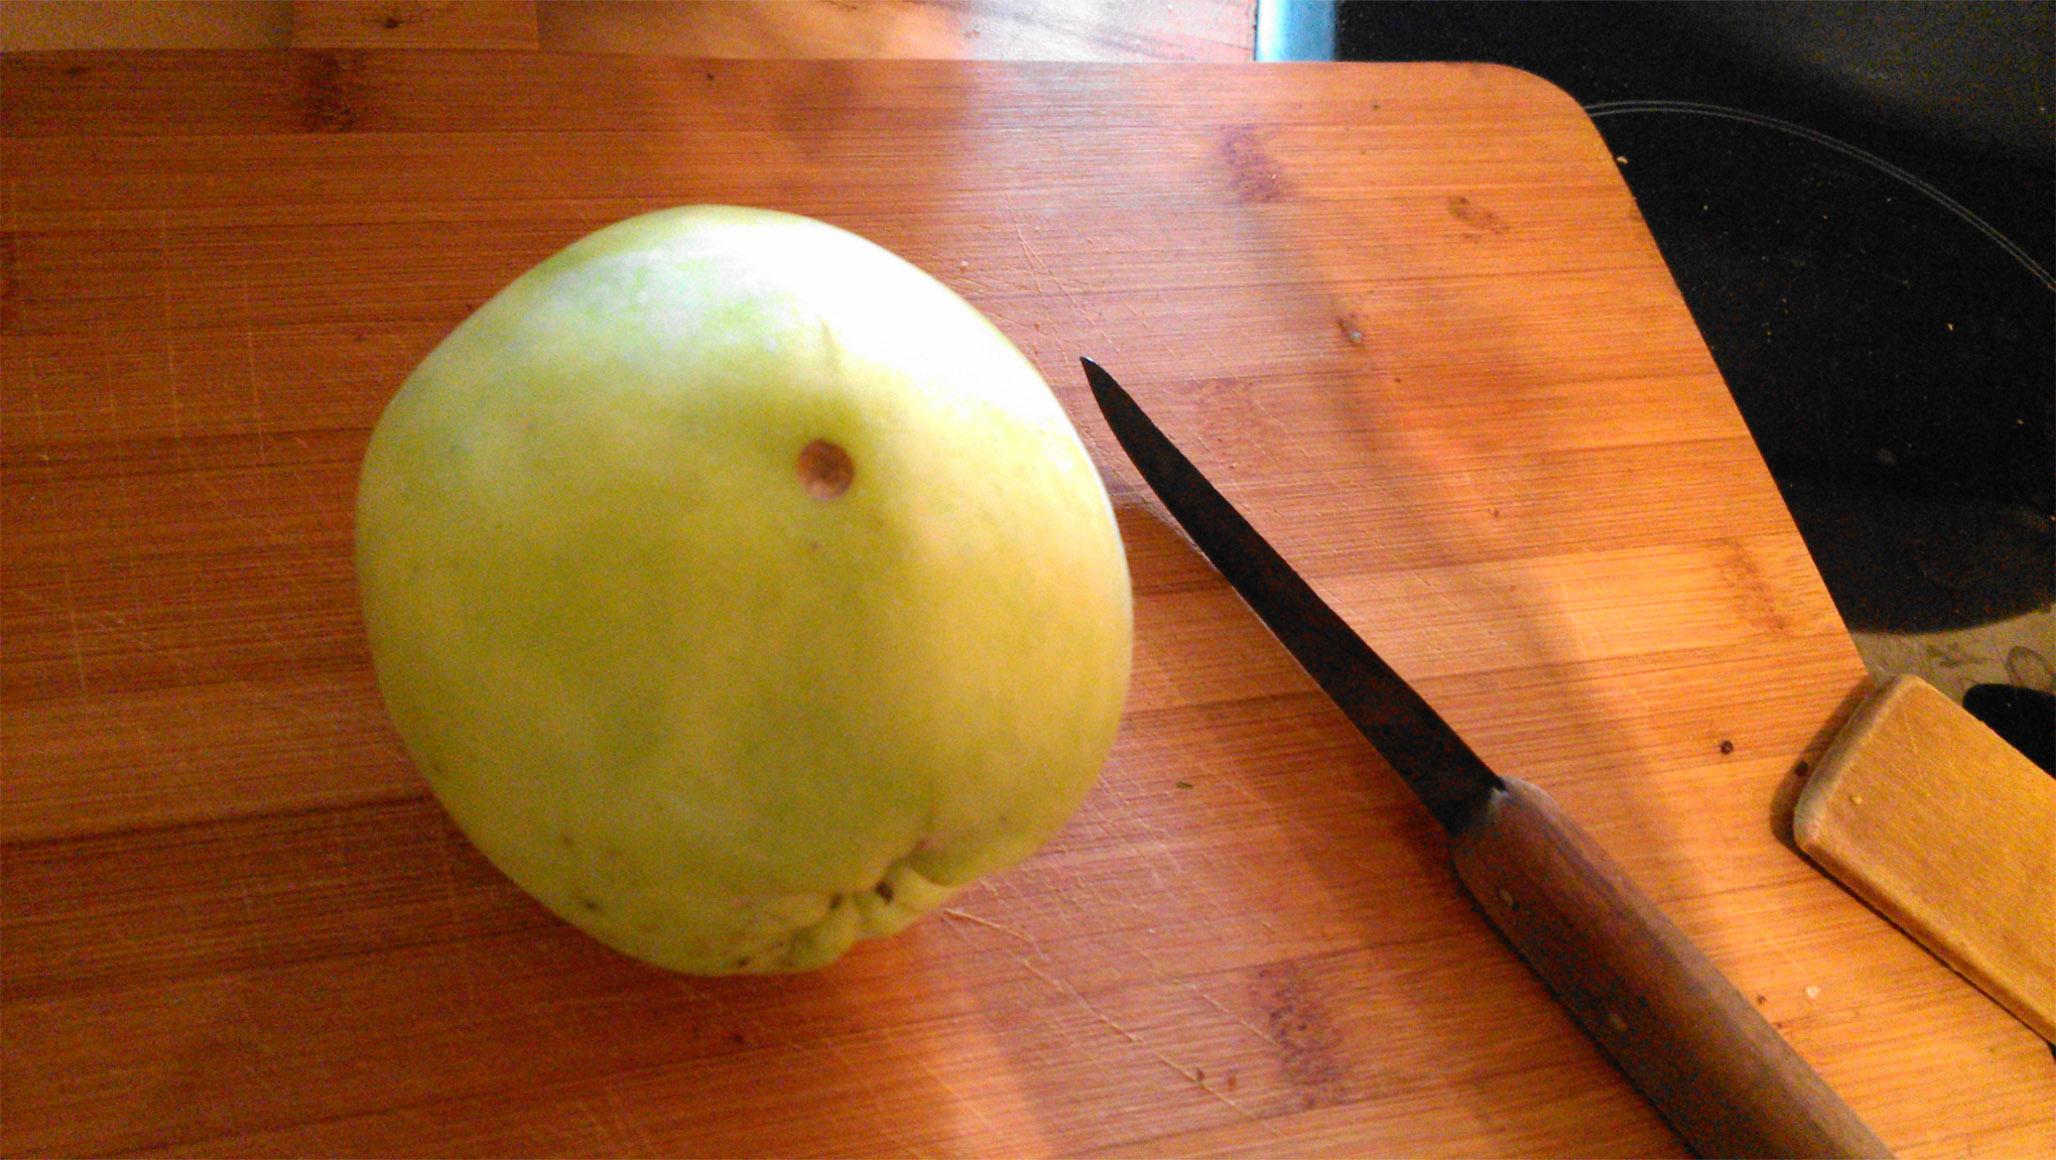 komische Stellen an Äpfeln ausm Garten? (Foto) (Obst, Aepfel)